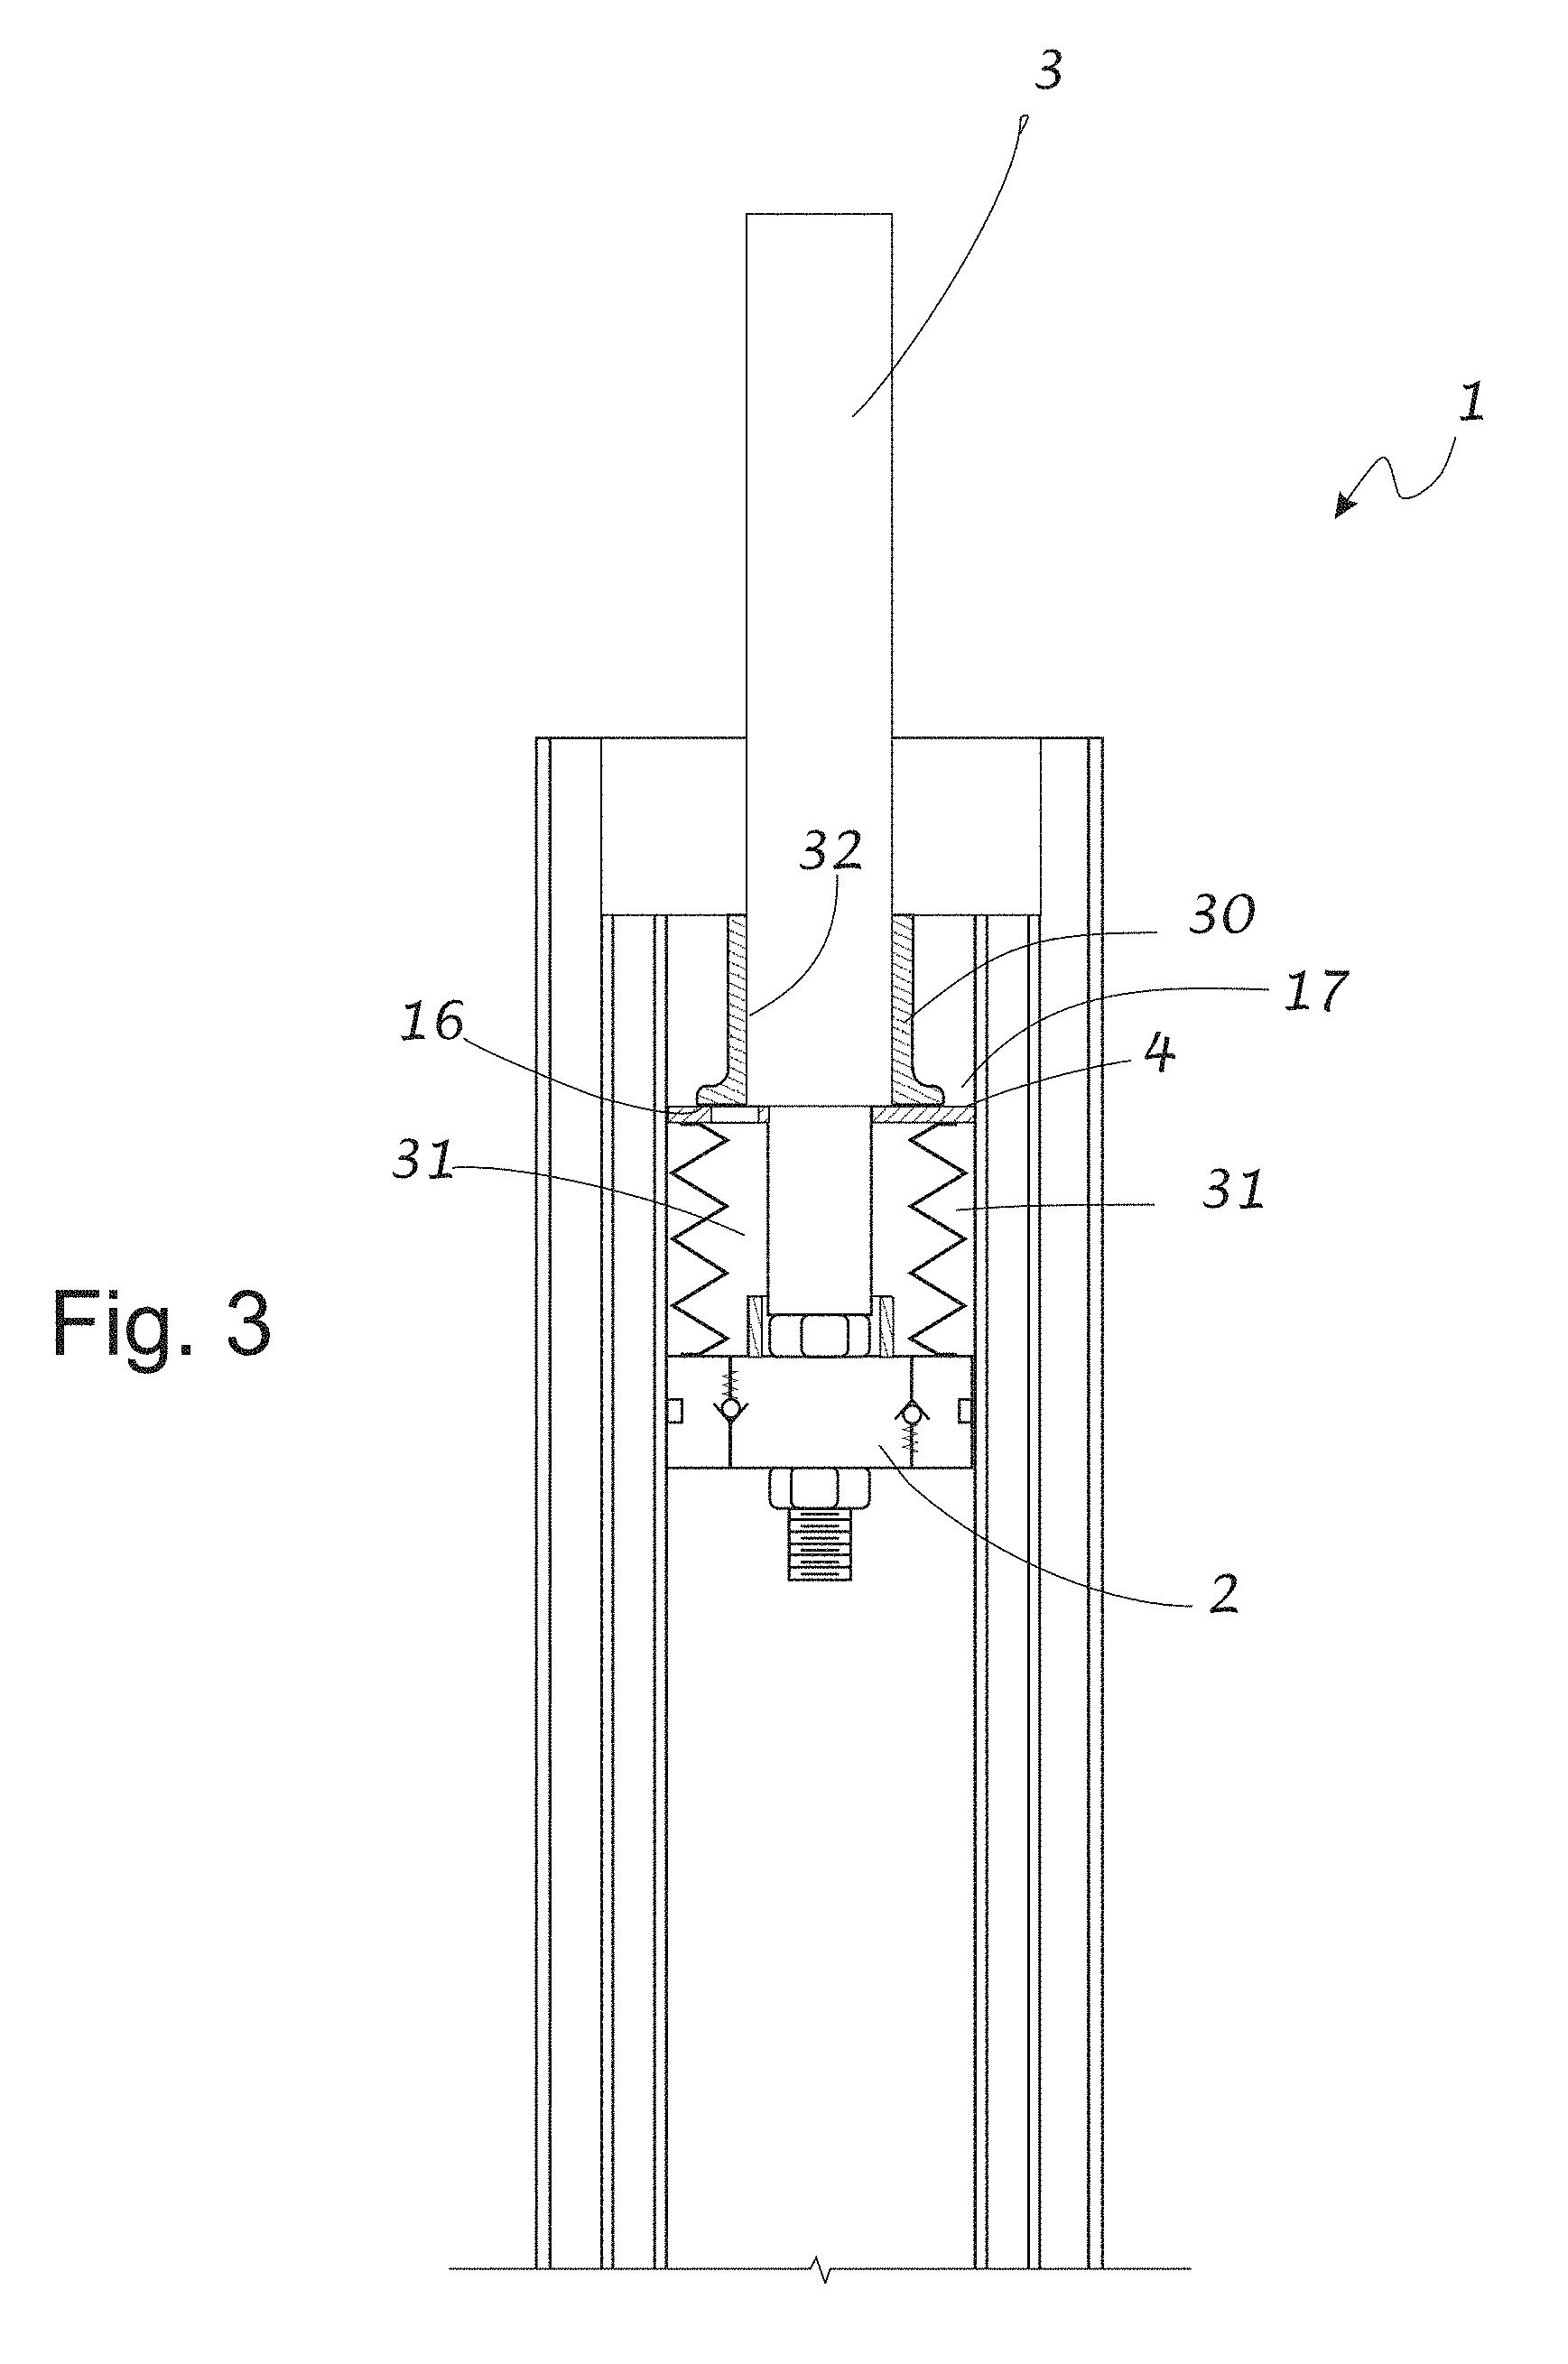 Patent Us 9702424 B2 Variable Resistor Circuit Diagram Physicslab January 2007 Part 1